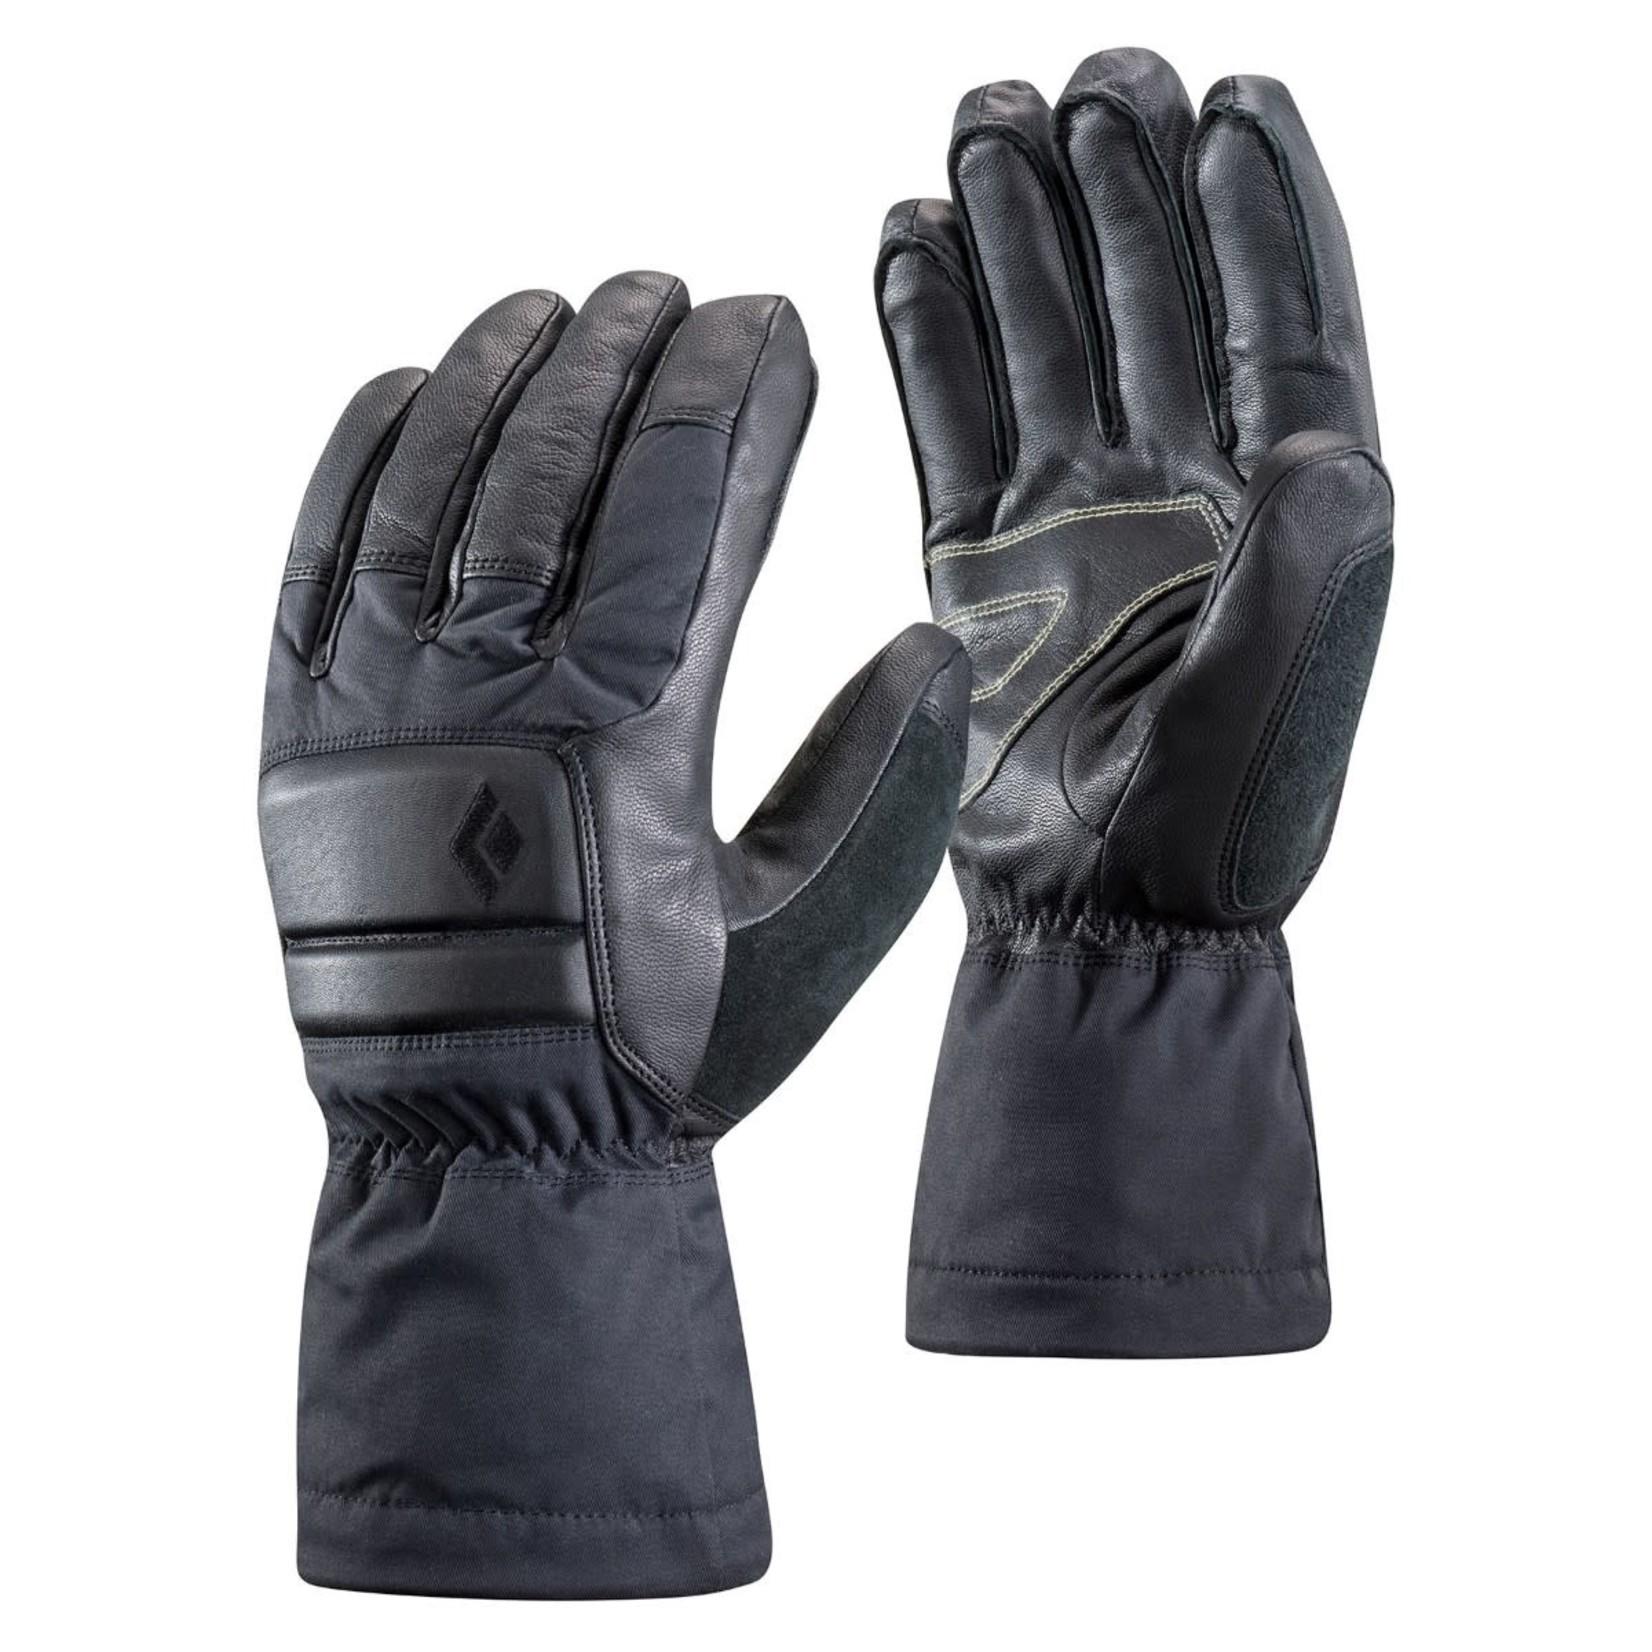 Black Diamond Black Diamond Spark Powder Gloves - Men